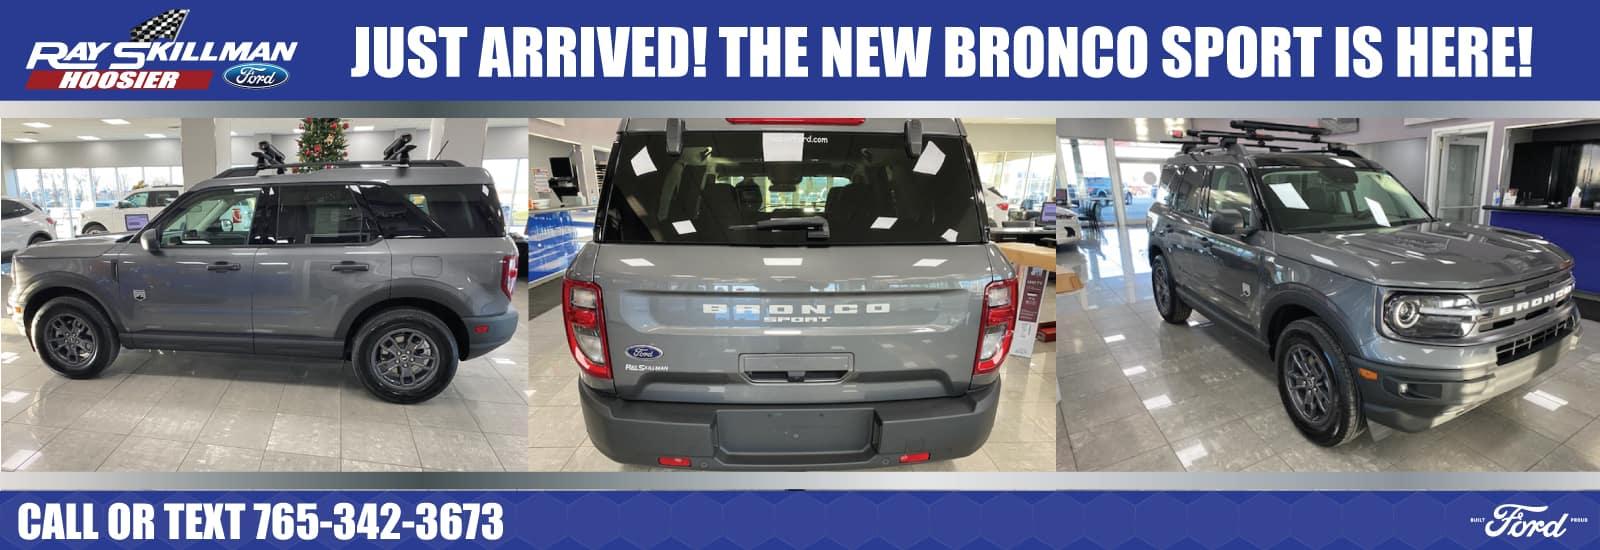 Ray-Skillman-Hoosier-Ford-Bronco-Web-Banner-1600×550